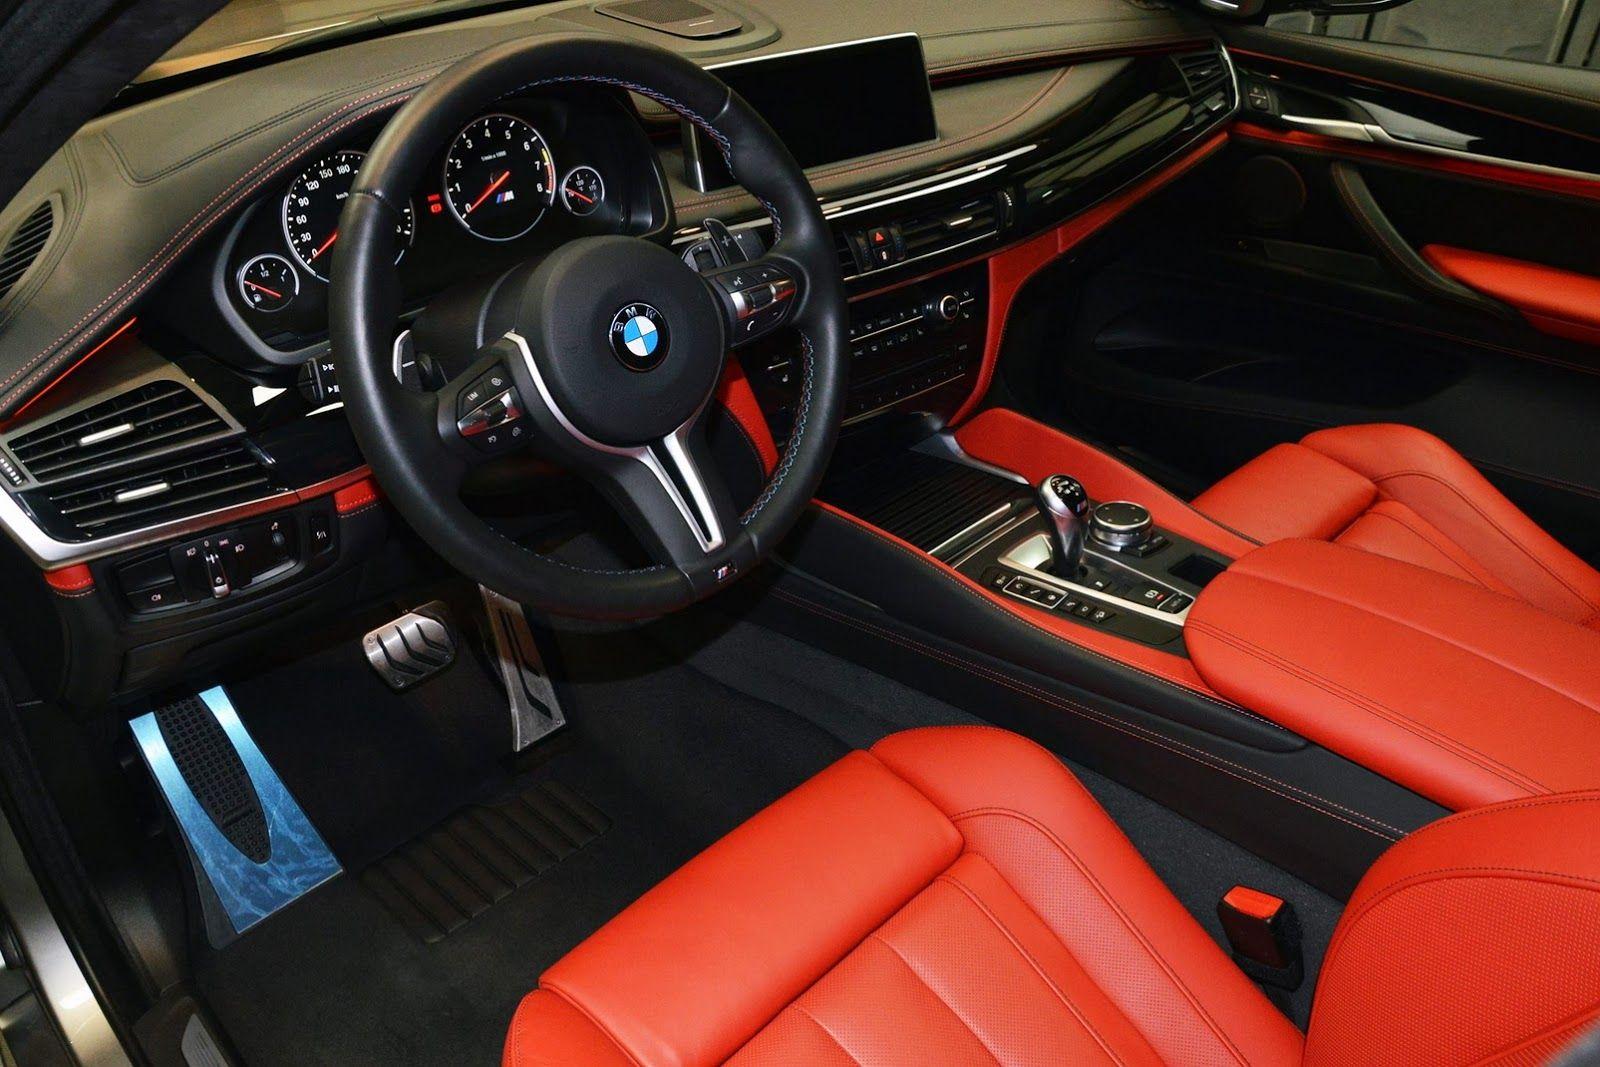 Bmw X6 M Gets A Makeover At Abu Dhabi Dealership Carscoops Bmw X6 Bmw Bmw X6 Interior